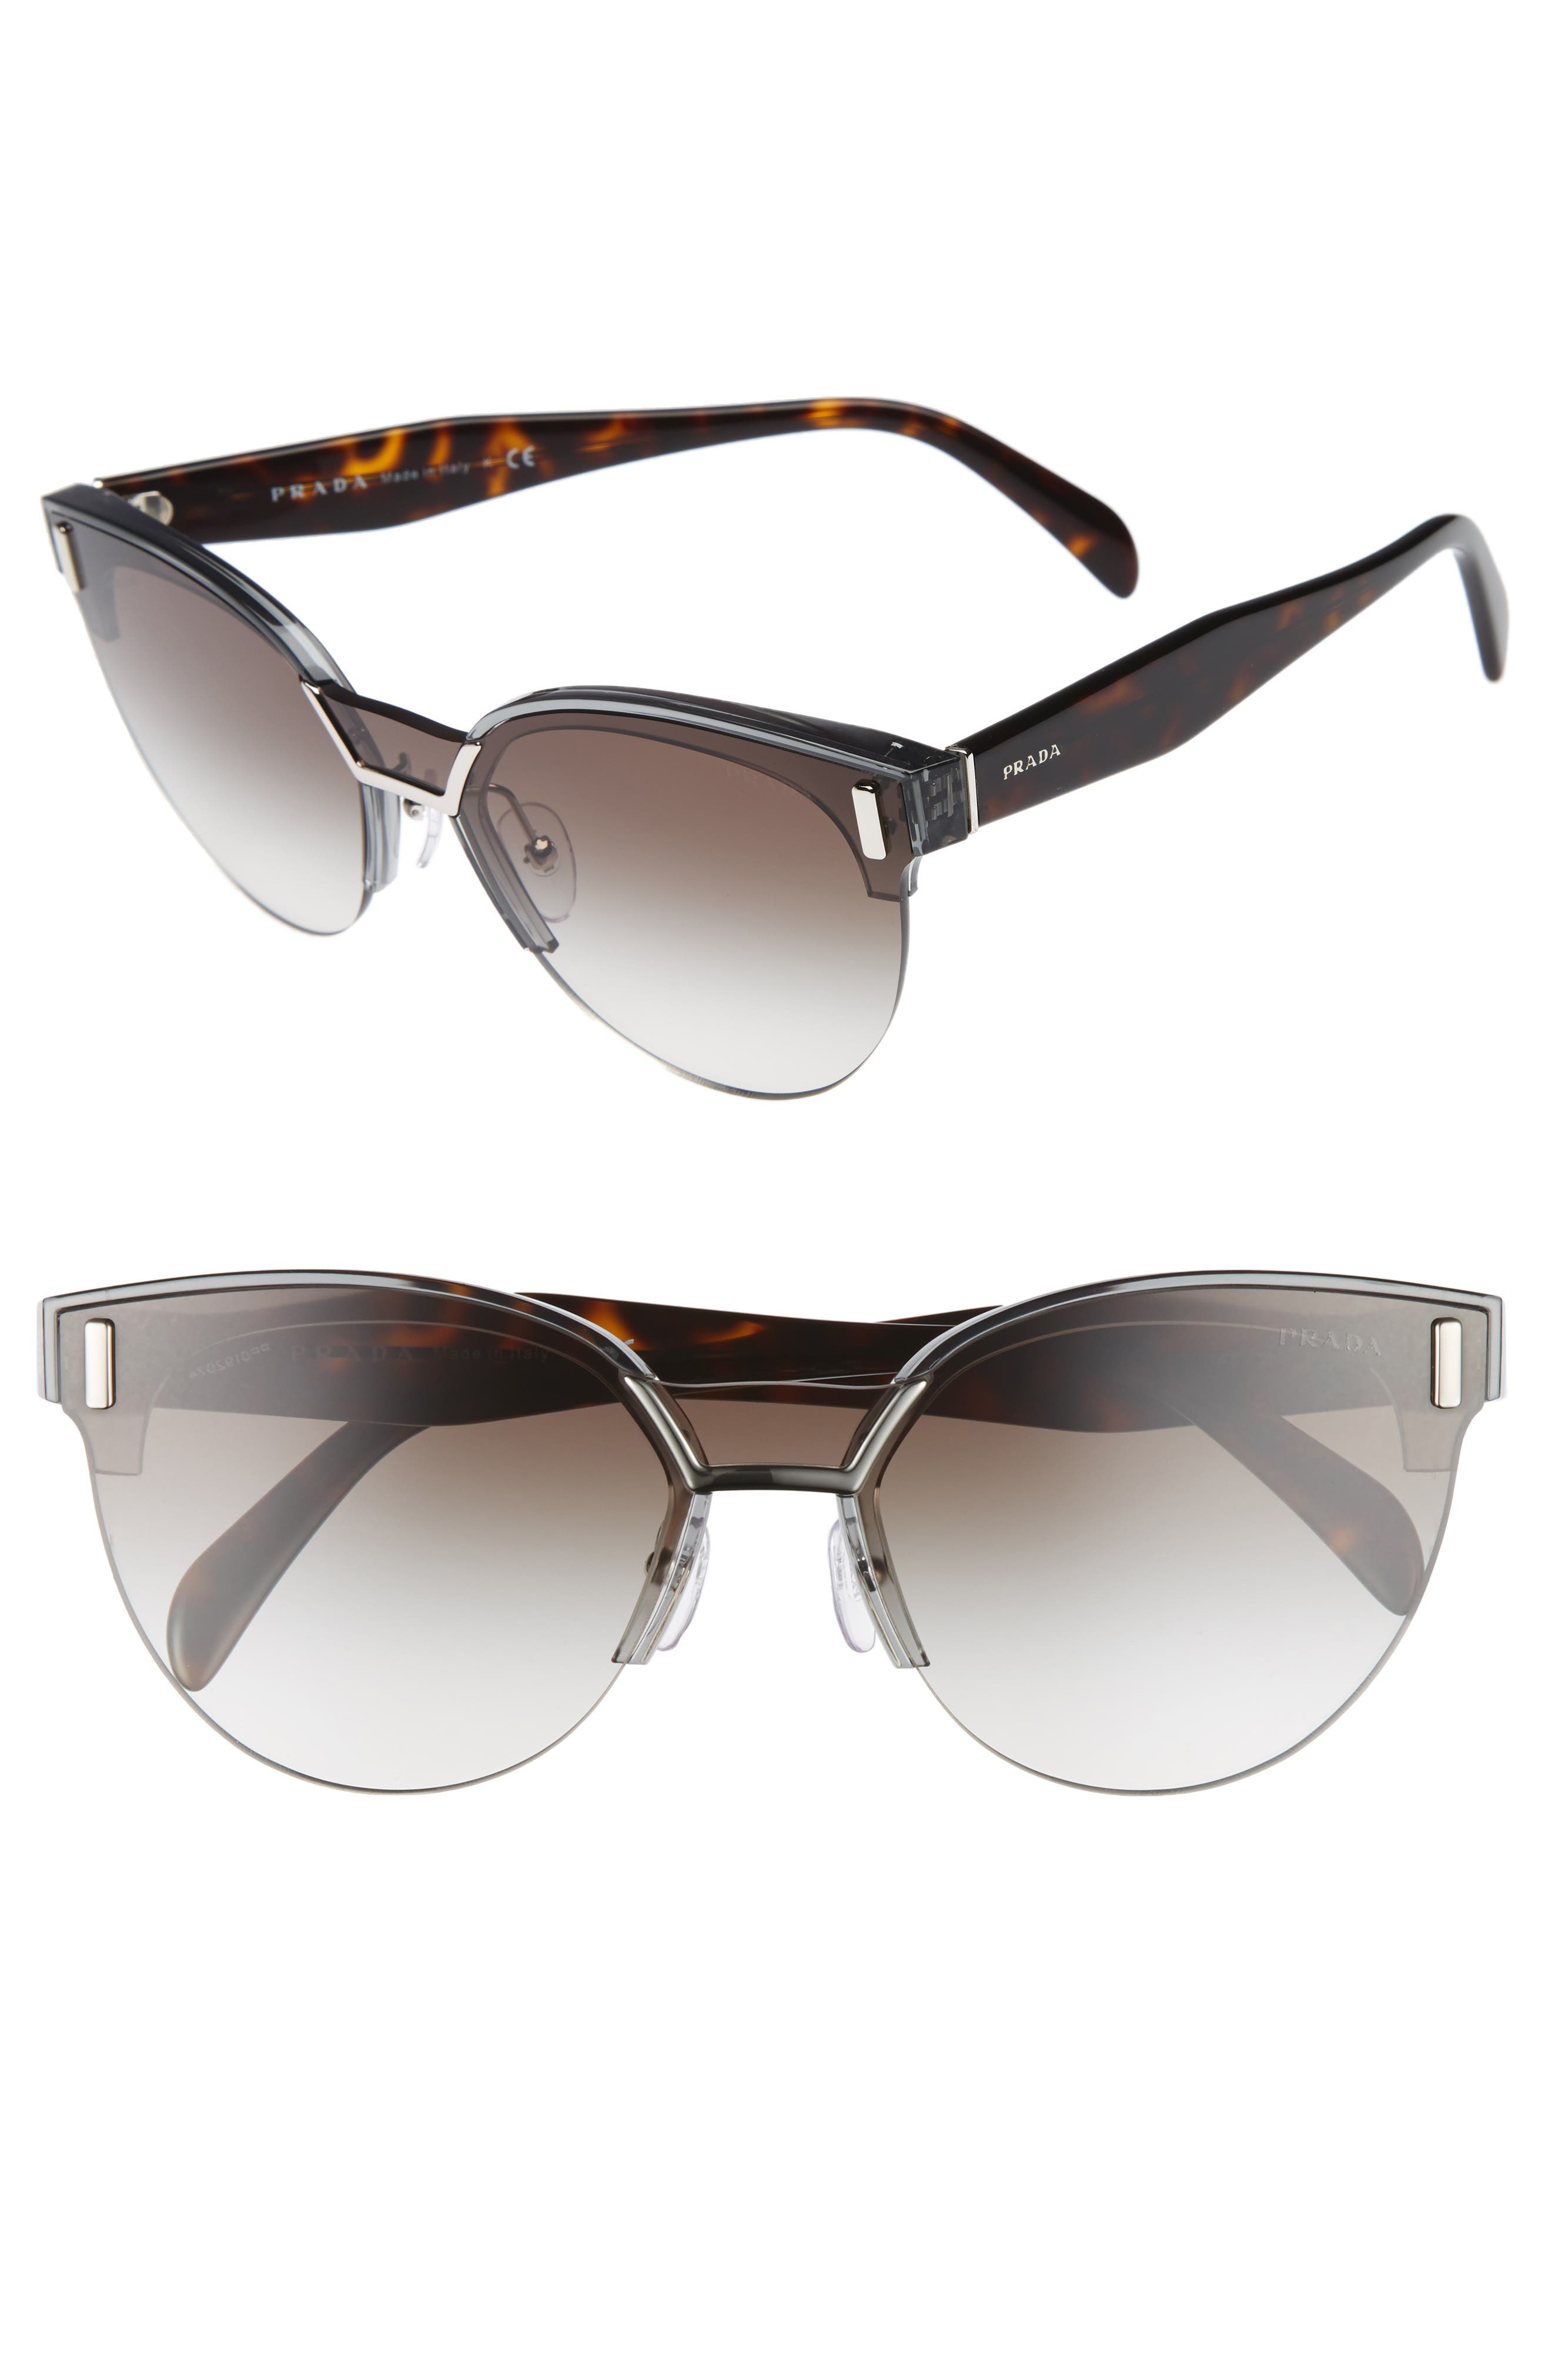 50mm Semi Rimless Gradient Sunglasses,                             Main thumbnail 1, color,                             Grey Gradient